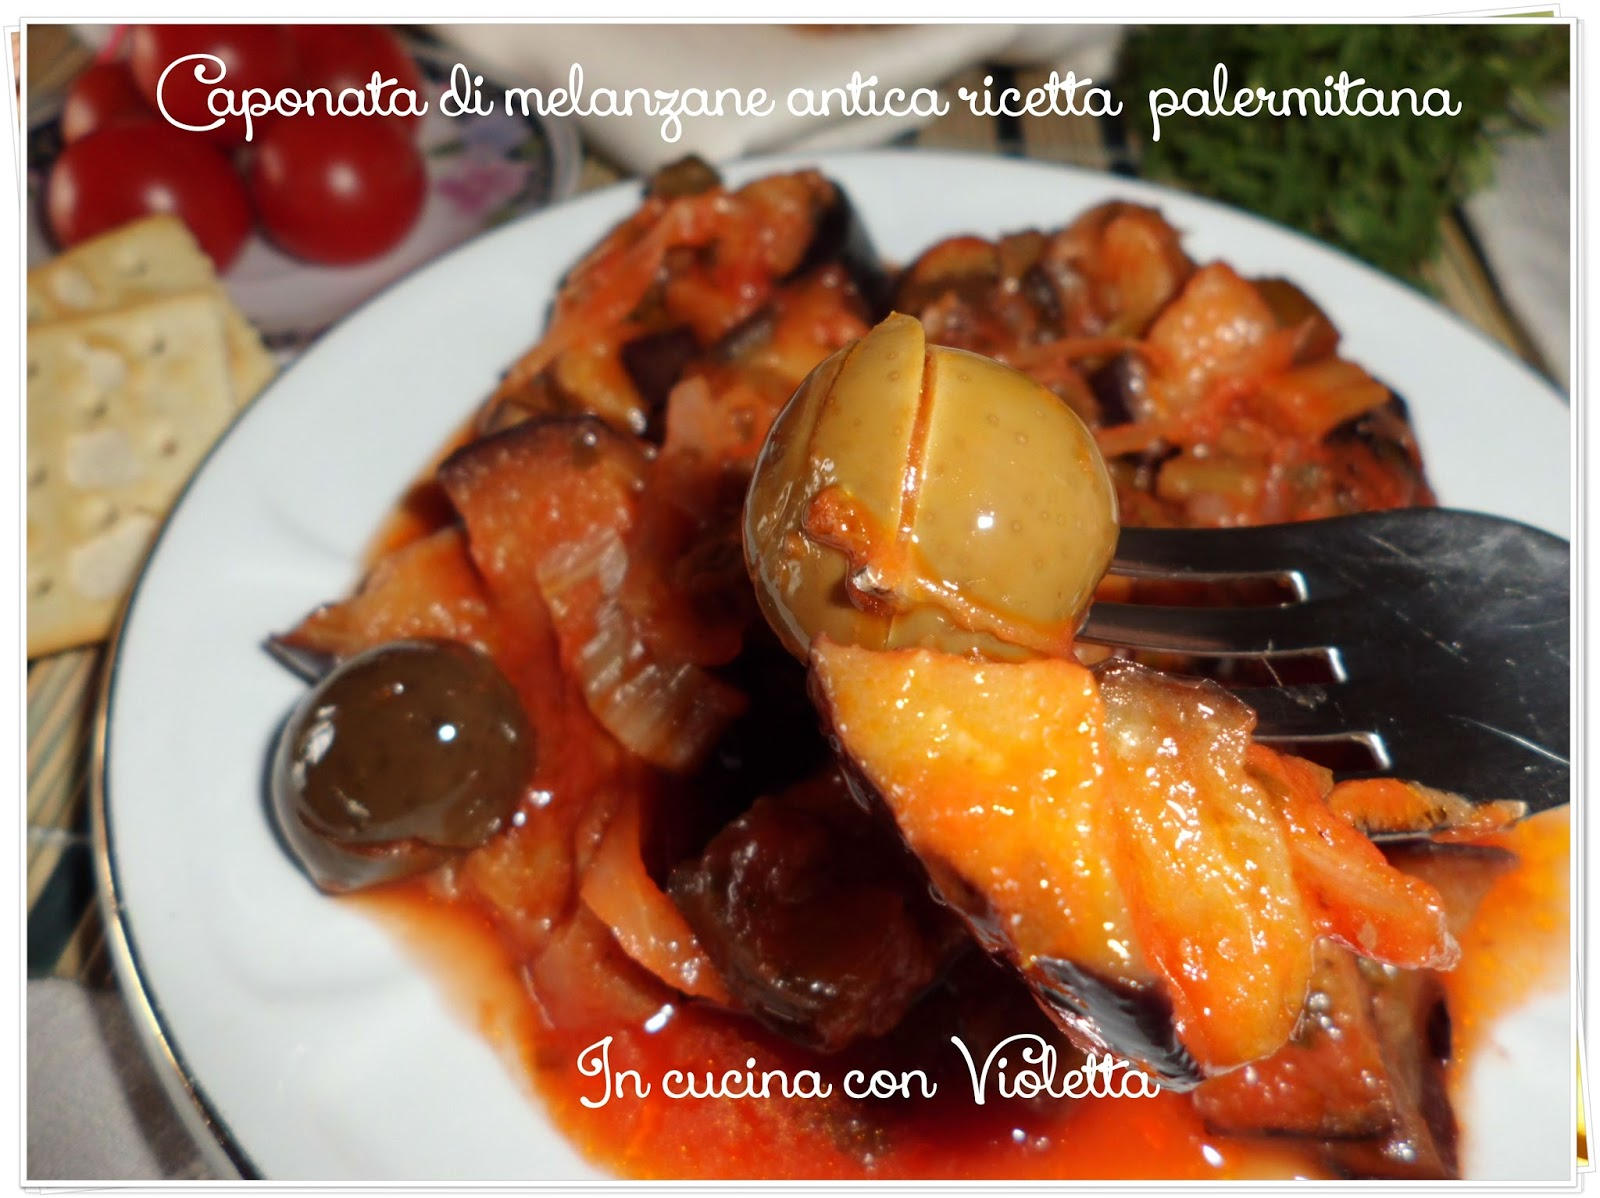 caponata di melanzane antica ricetta palermitana